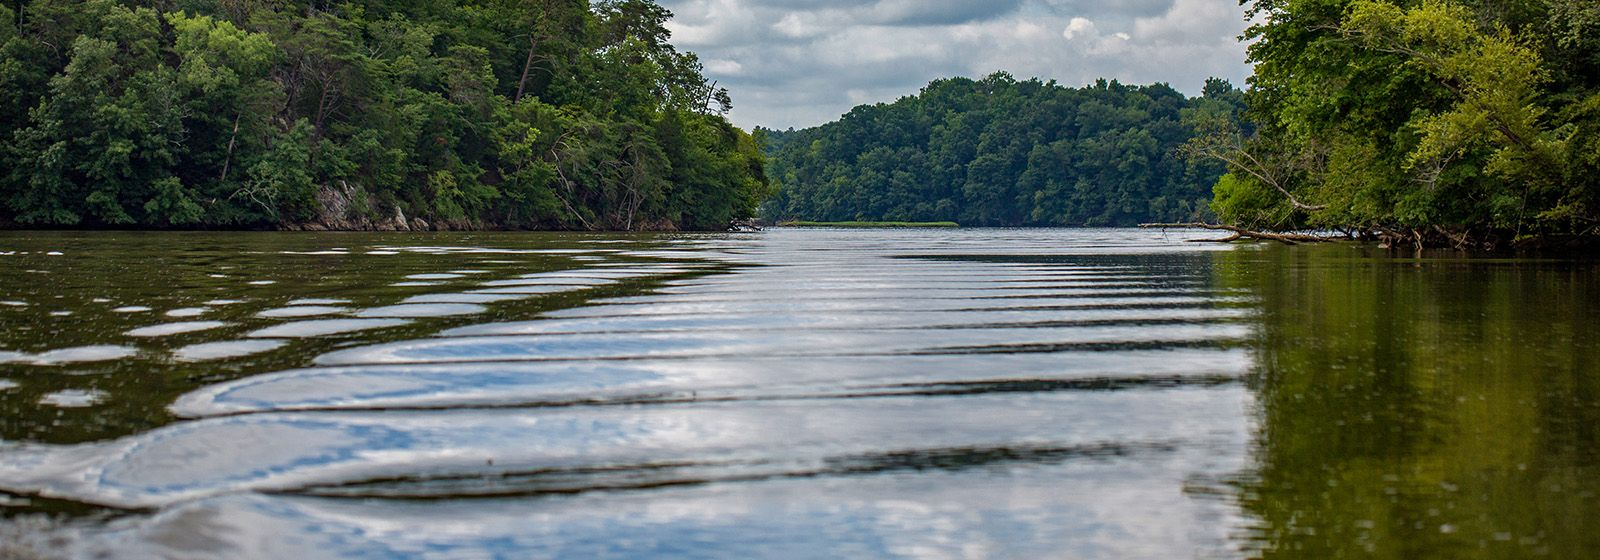 DUKE ILLUMINATION – New Life on Catawba River Sparks Recreational Tourism